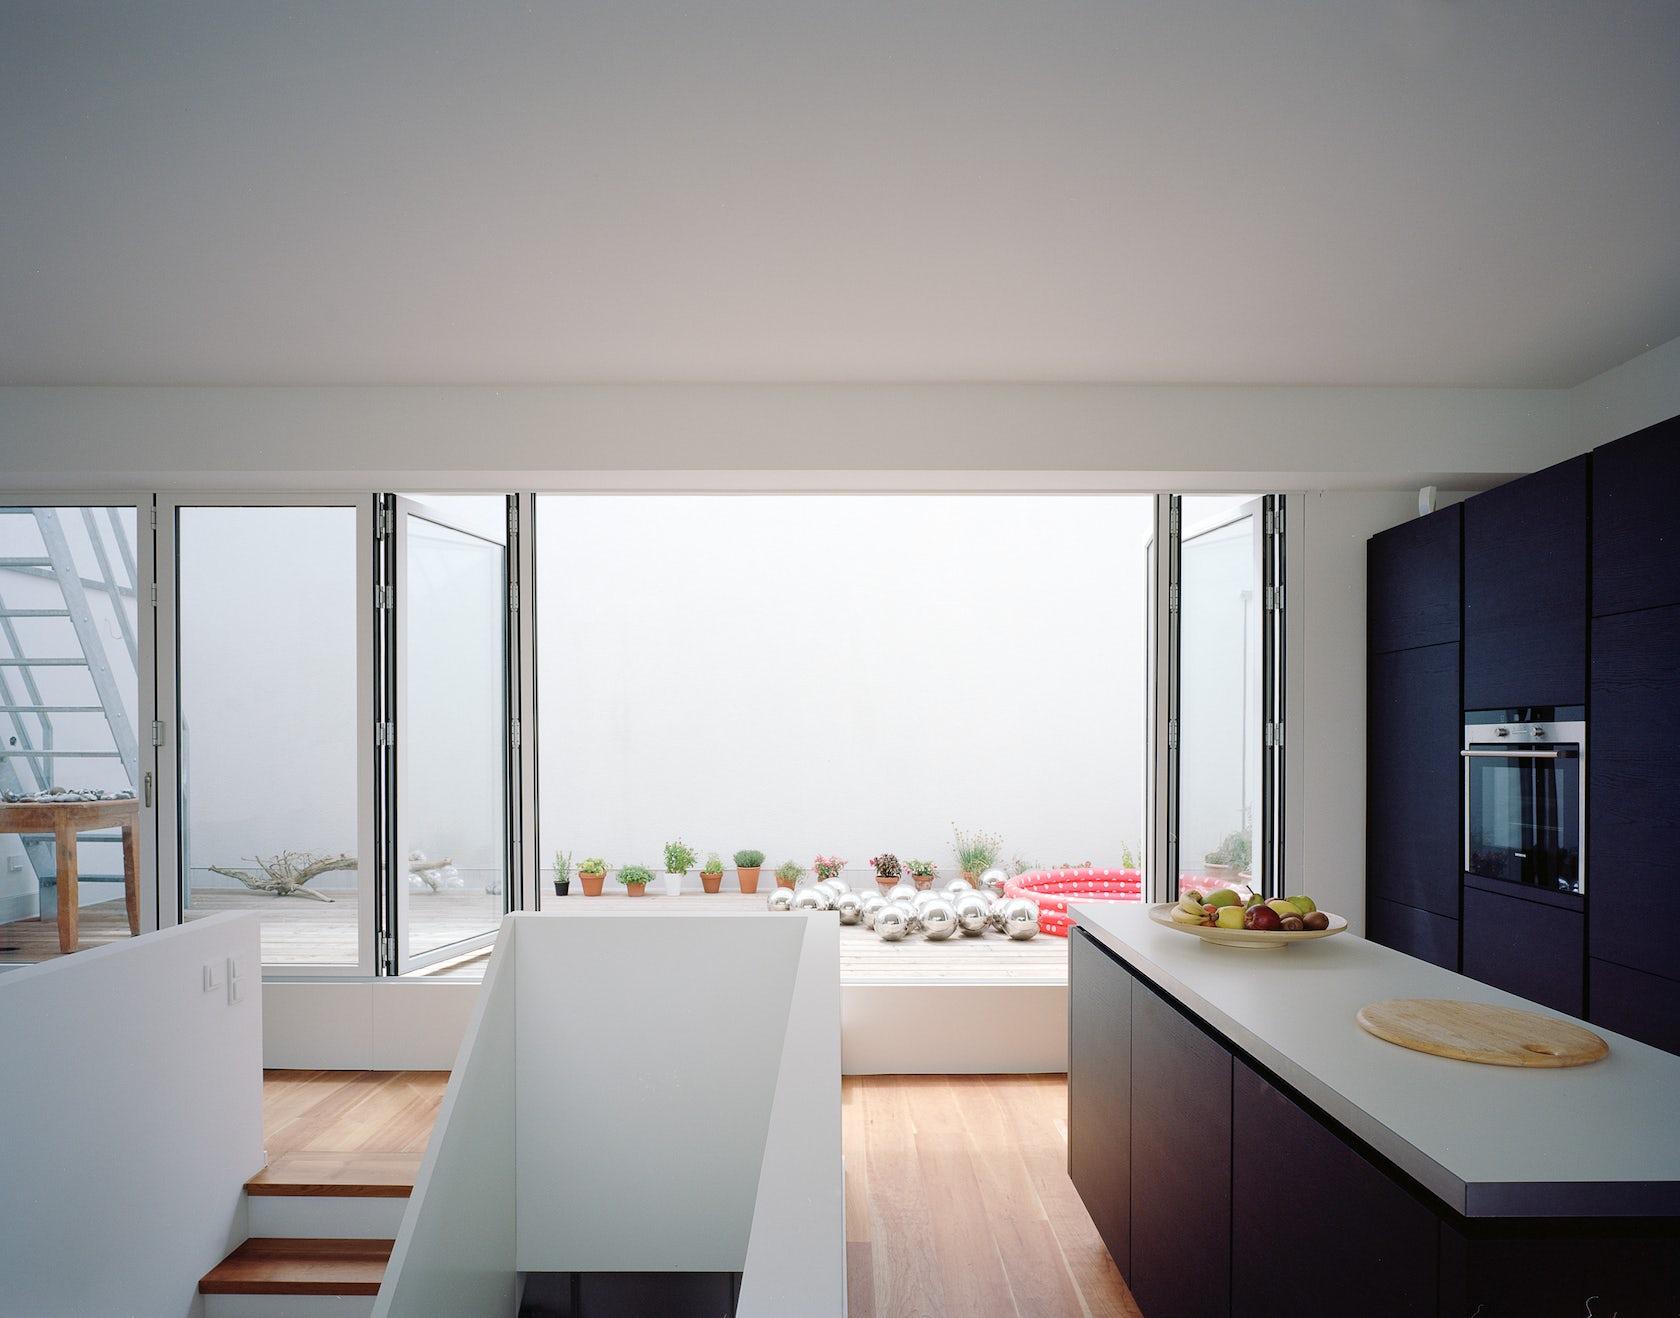 ze05 - New development of a residential estate ...